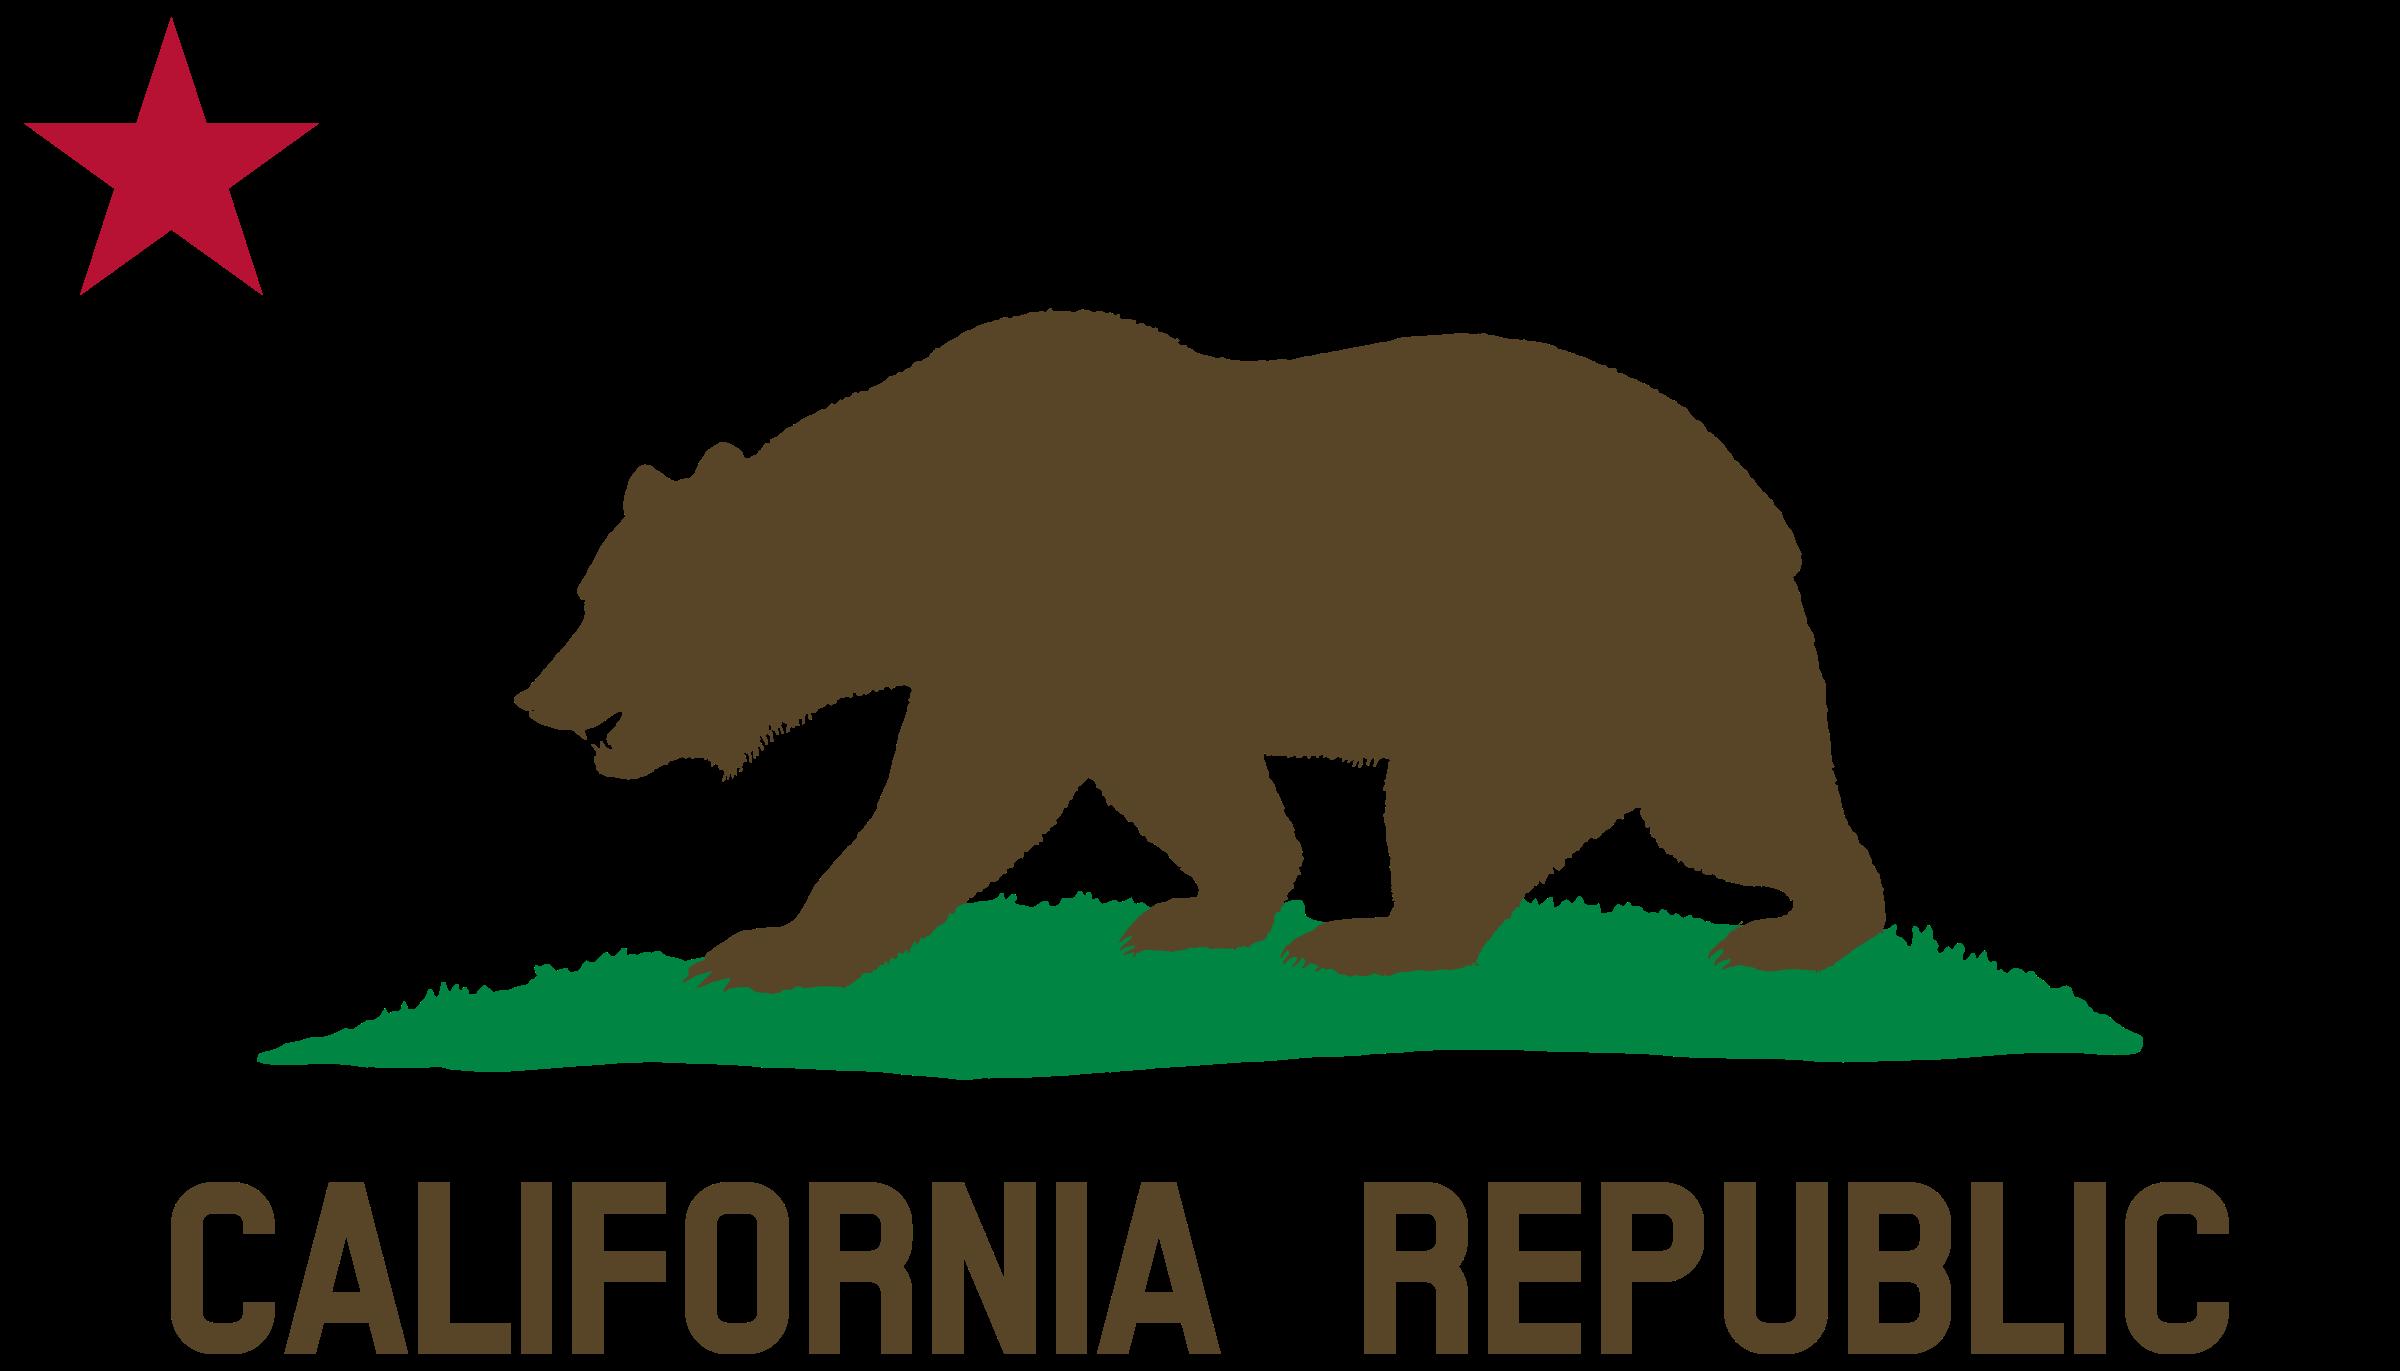 graphic black and white California clipart symbol california. Flag of bear star.